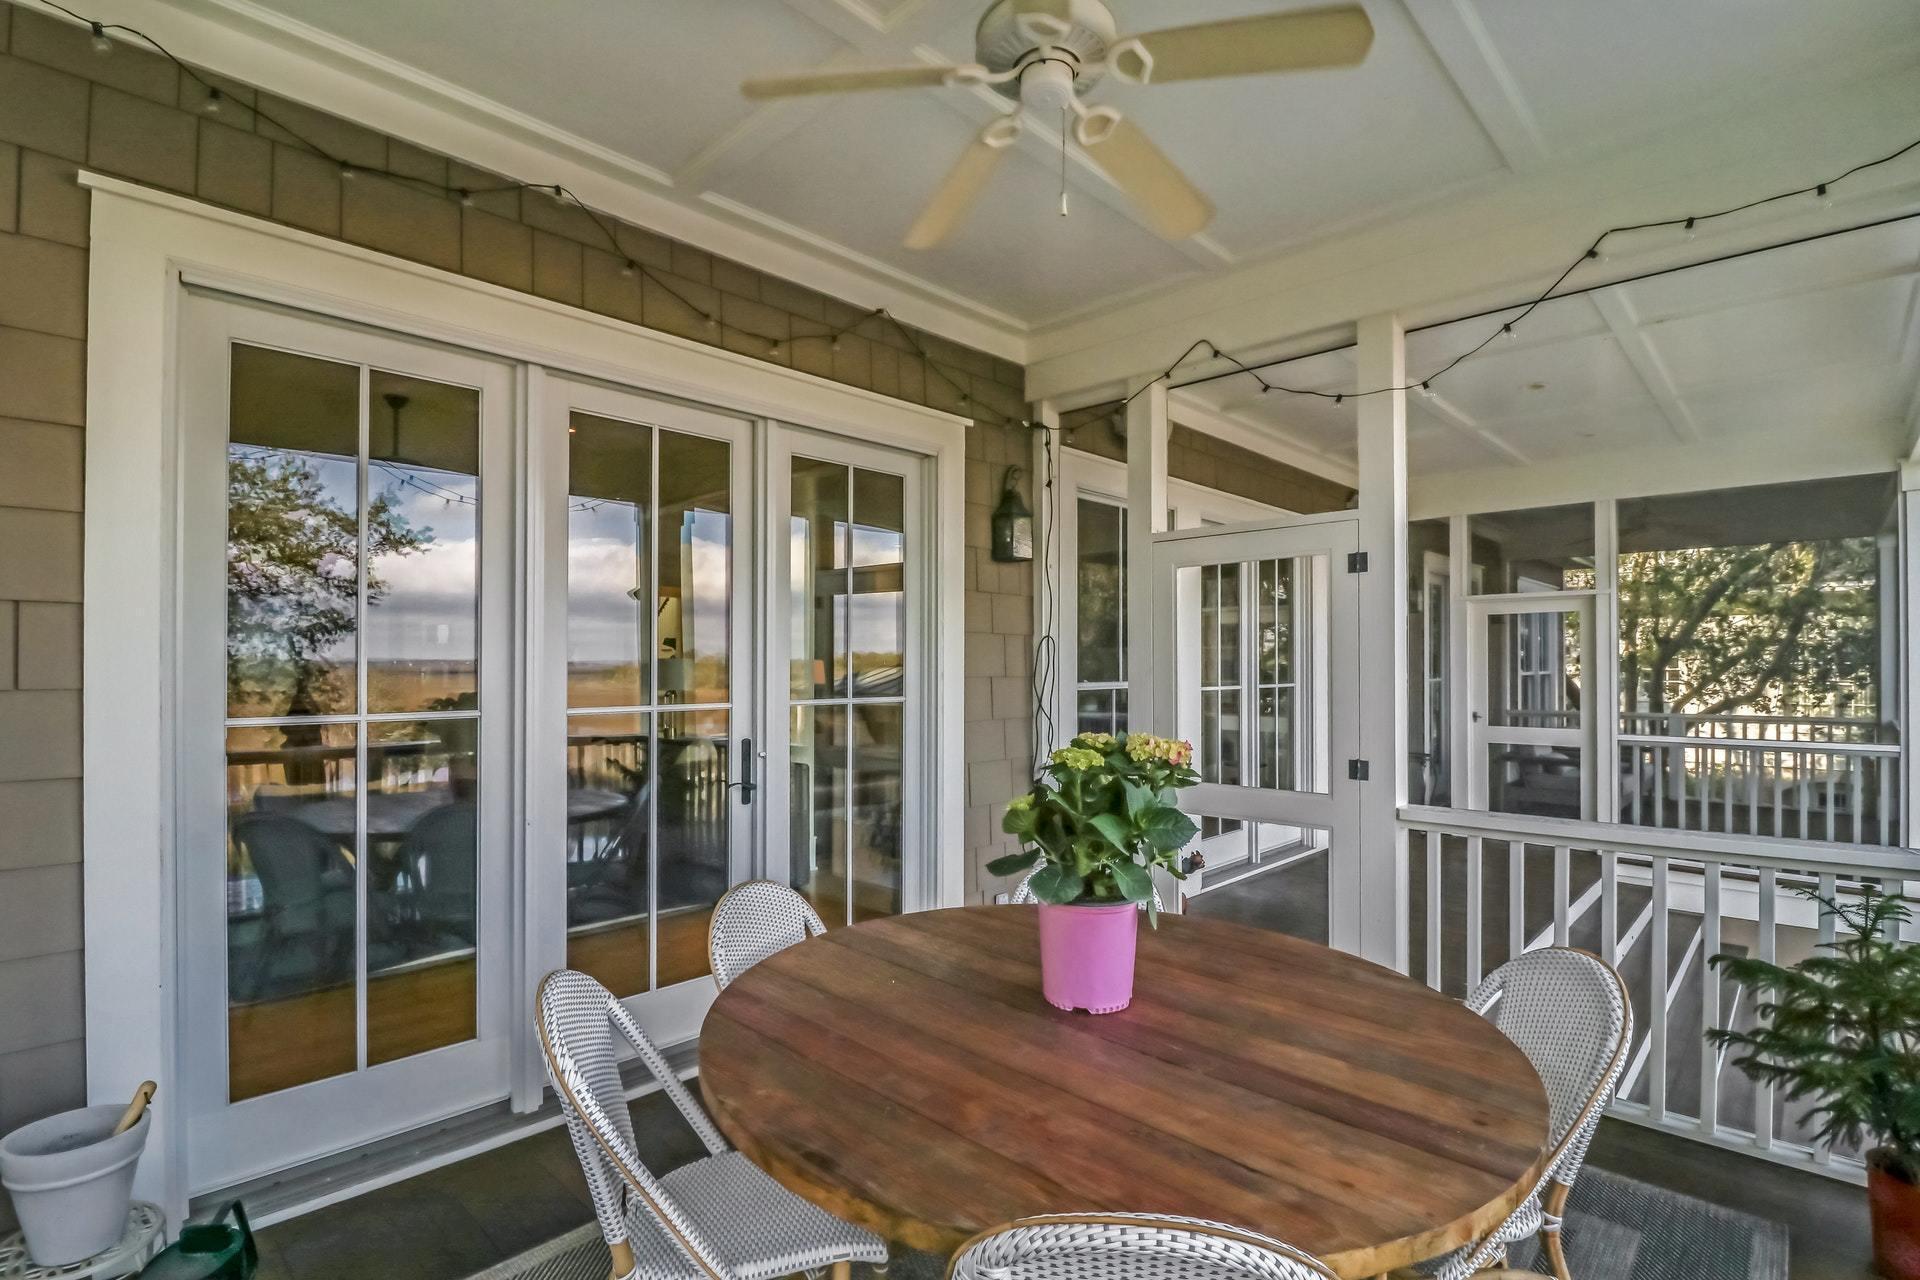 Waterway Island Homes For Sale - 7 Waterway Island Drive, Isle of Palms, SC - 26